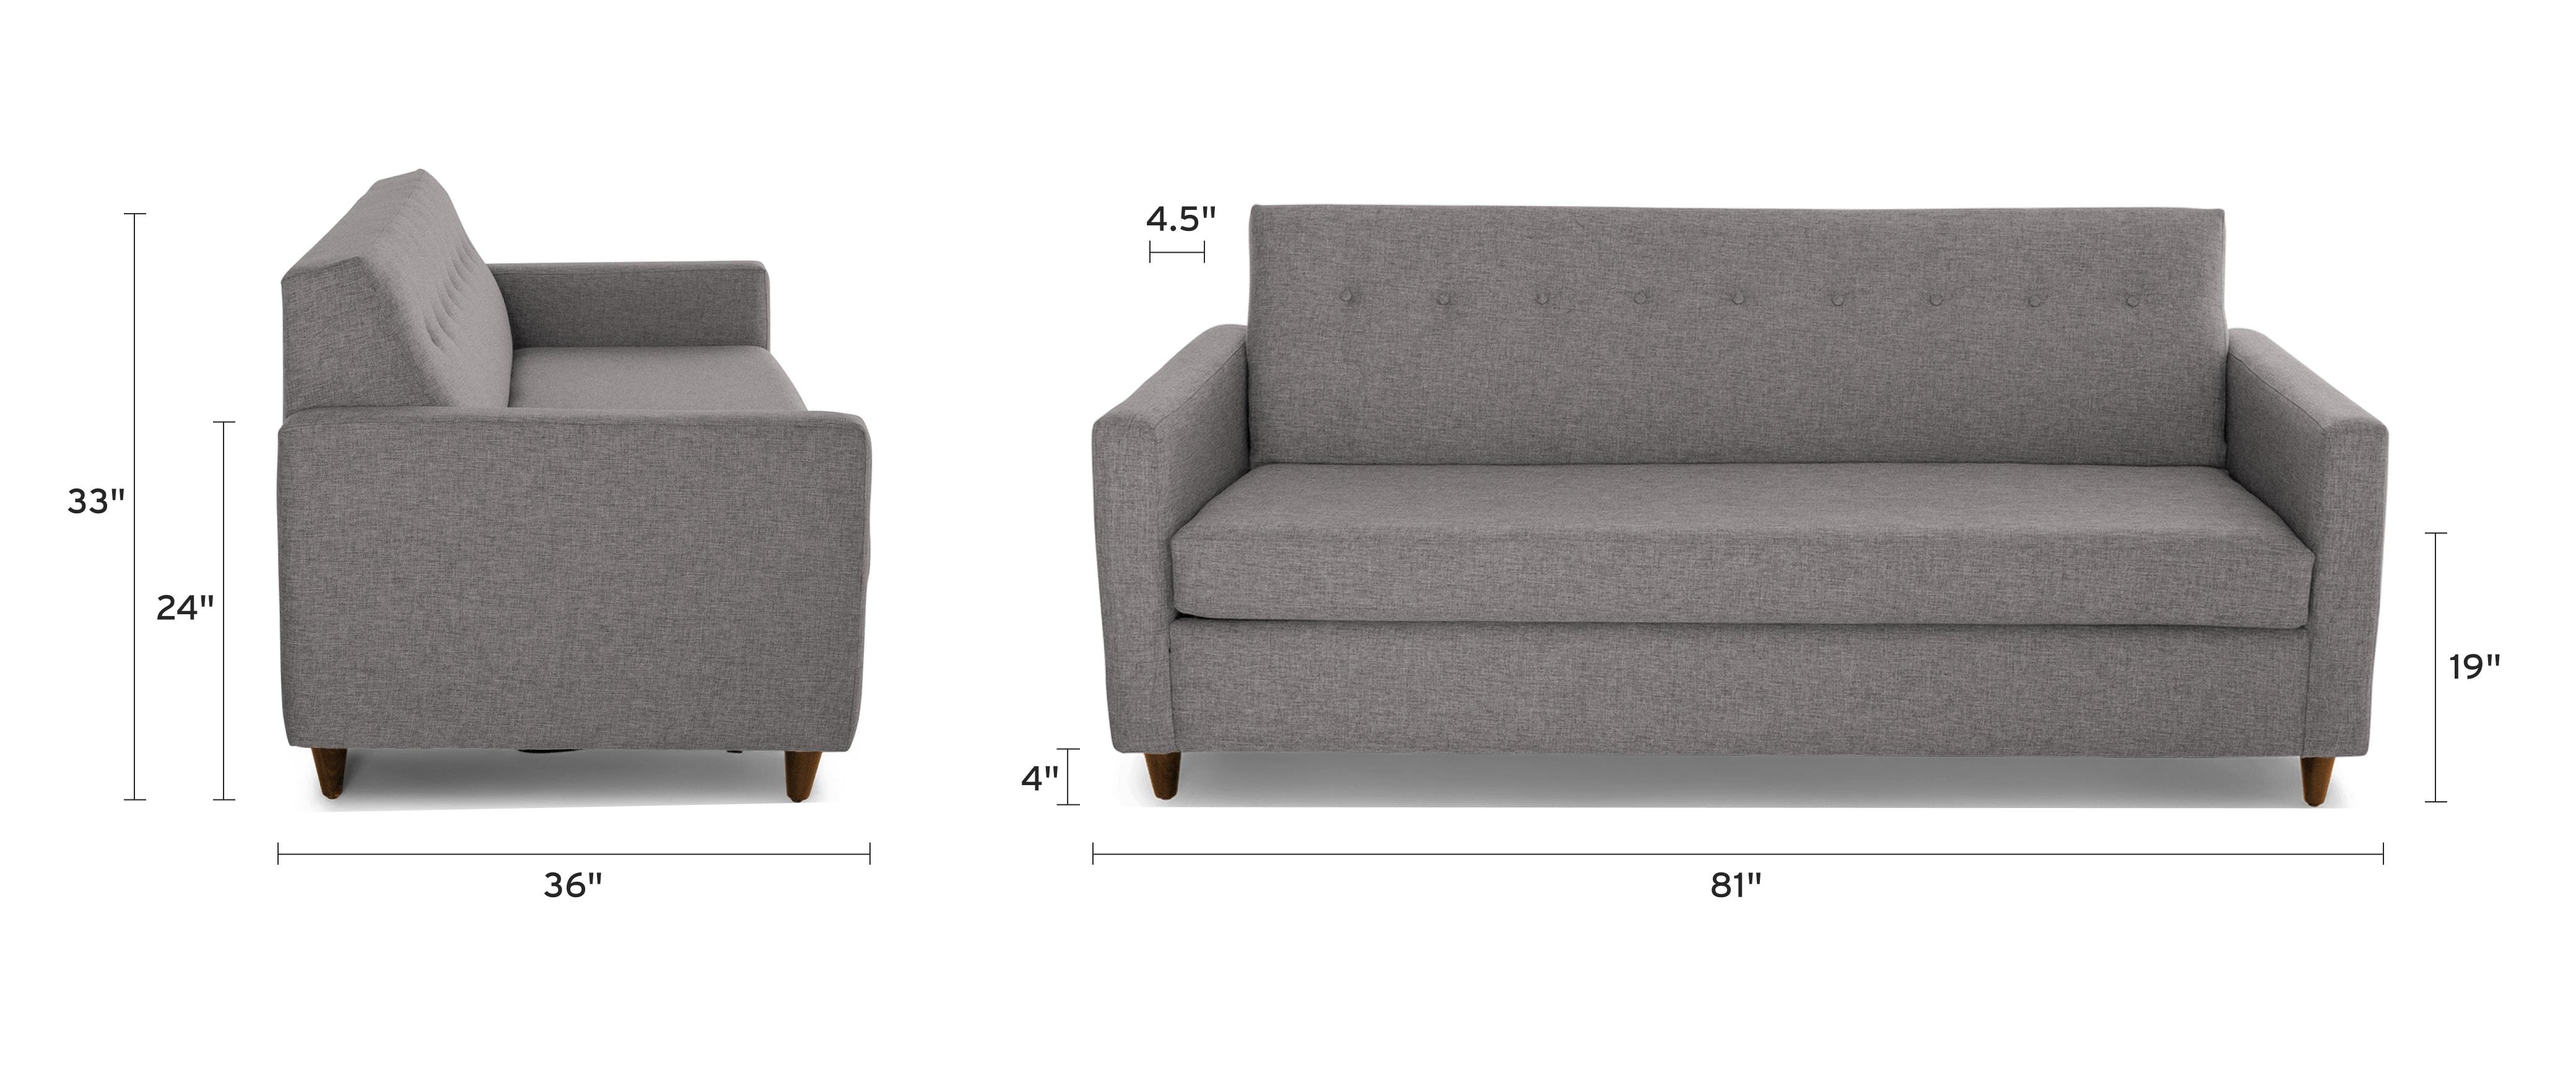 korver sleeper sofa dimensional image